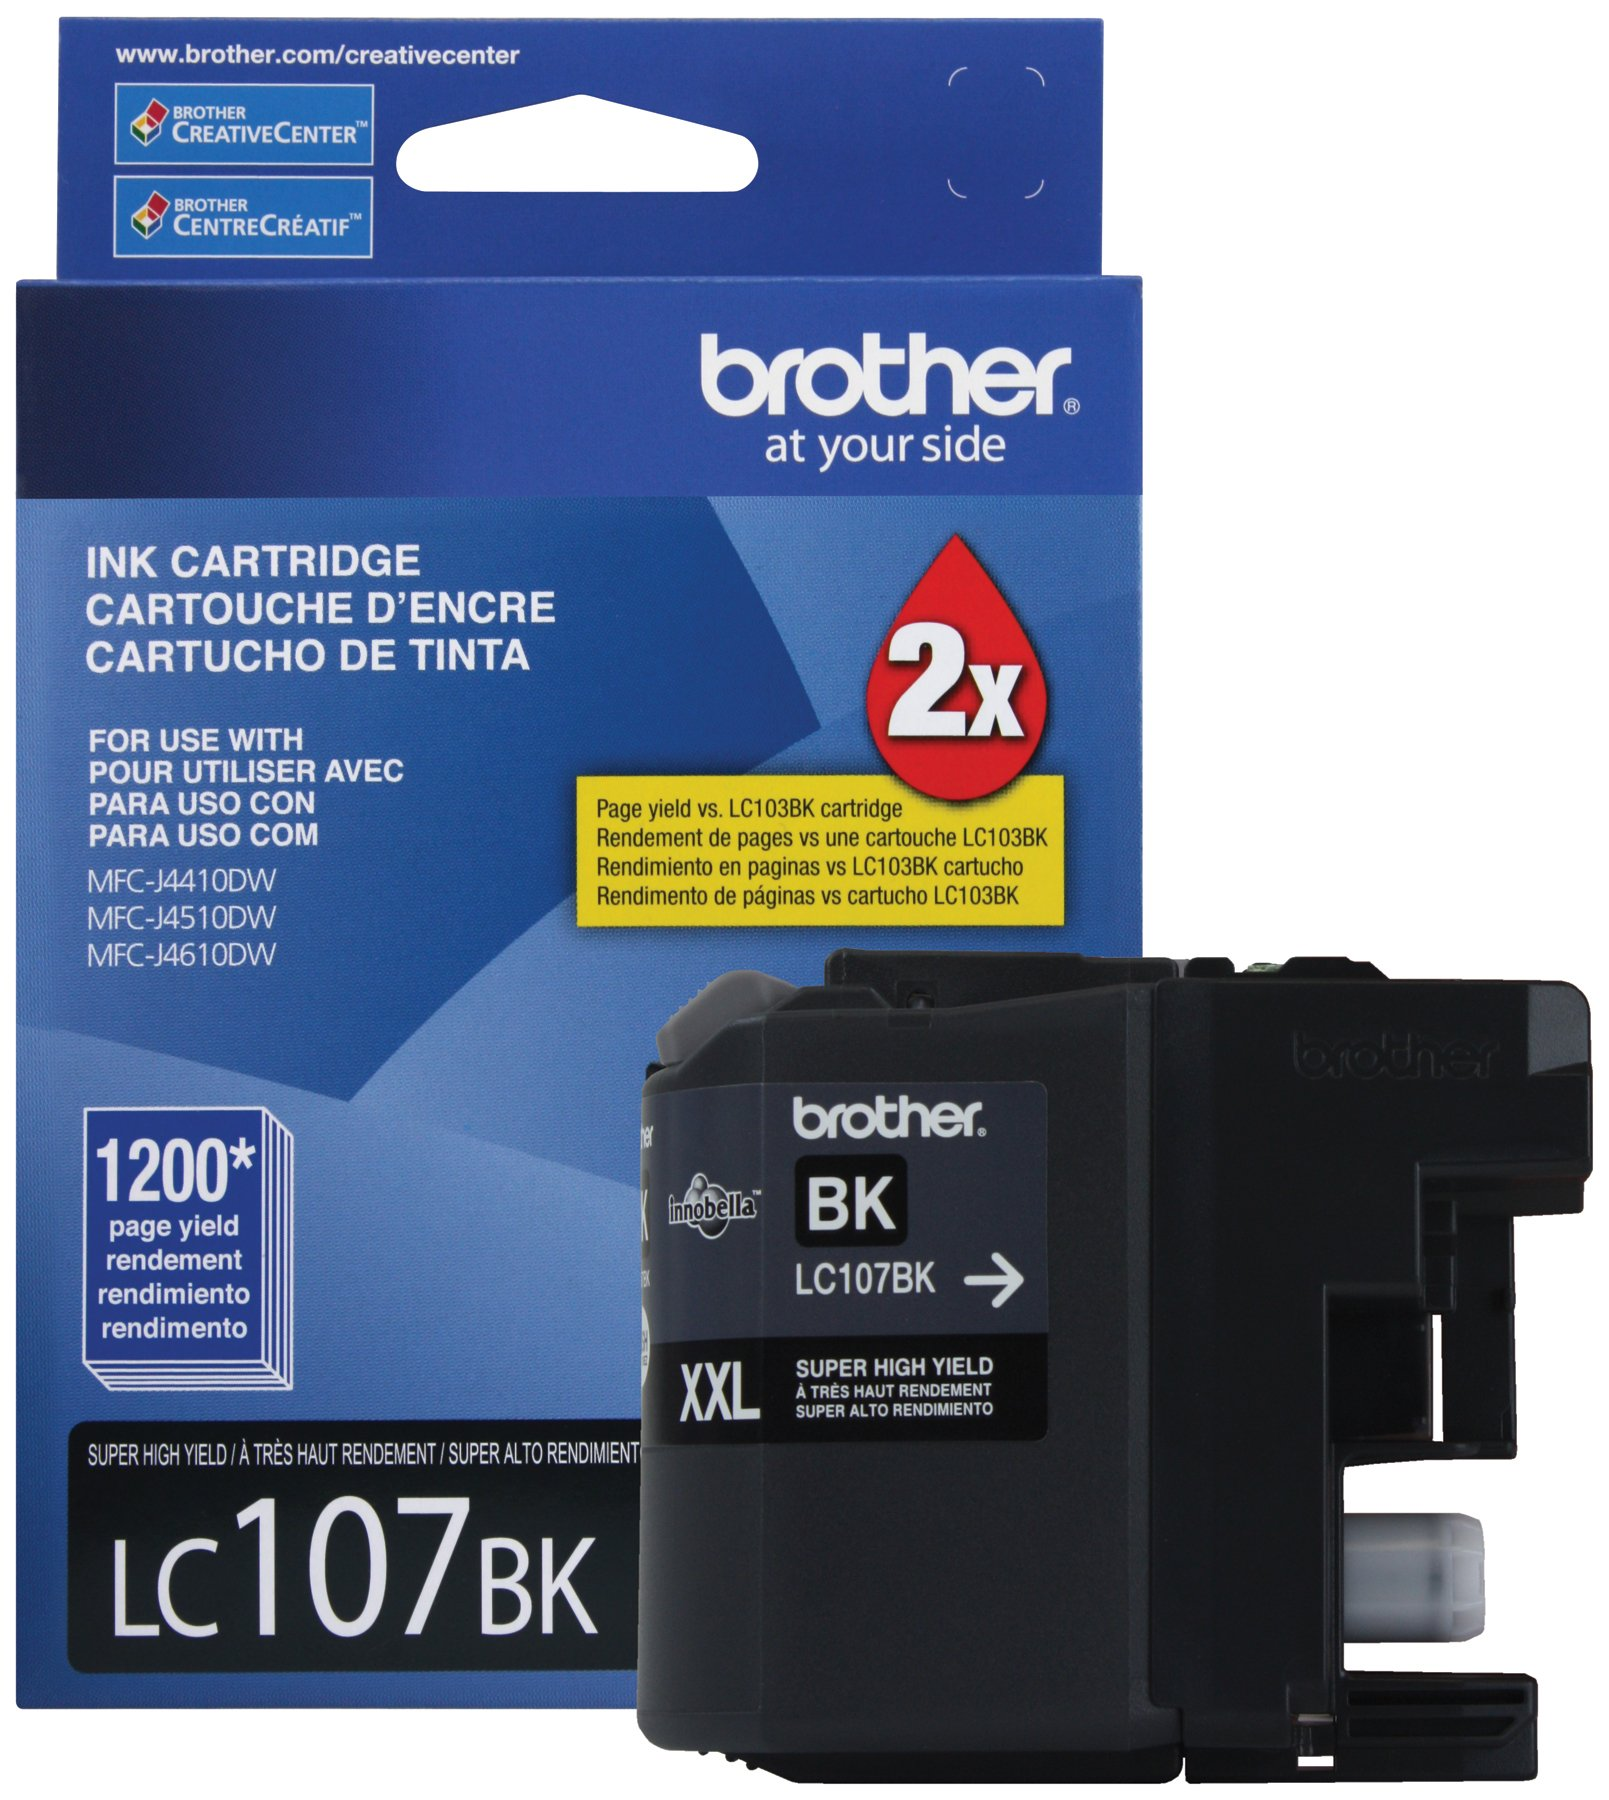 Brother Printer LC107BK Super High Yield Cartridge Ink, Black